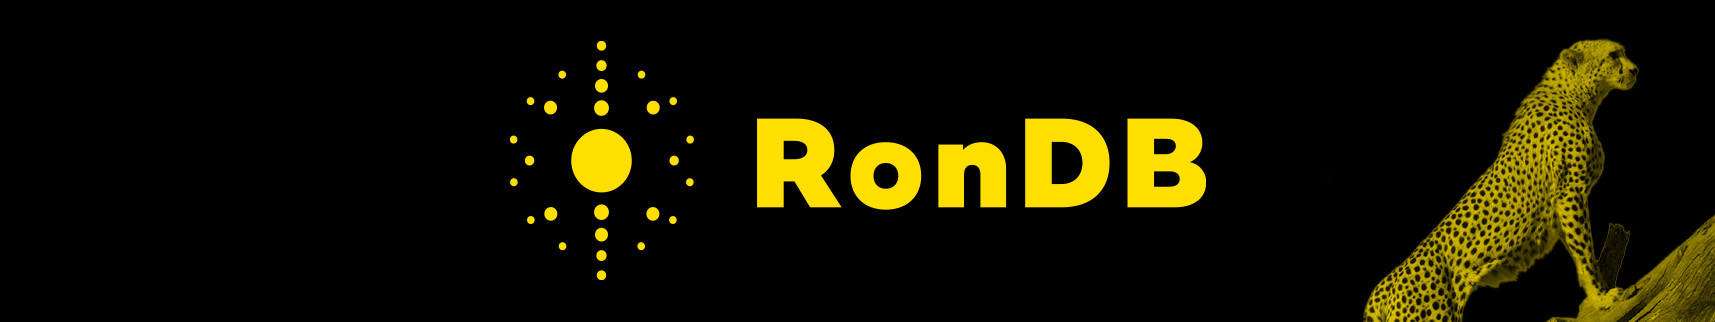 RonDB Logo